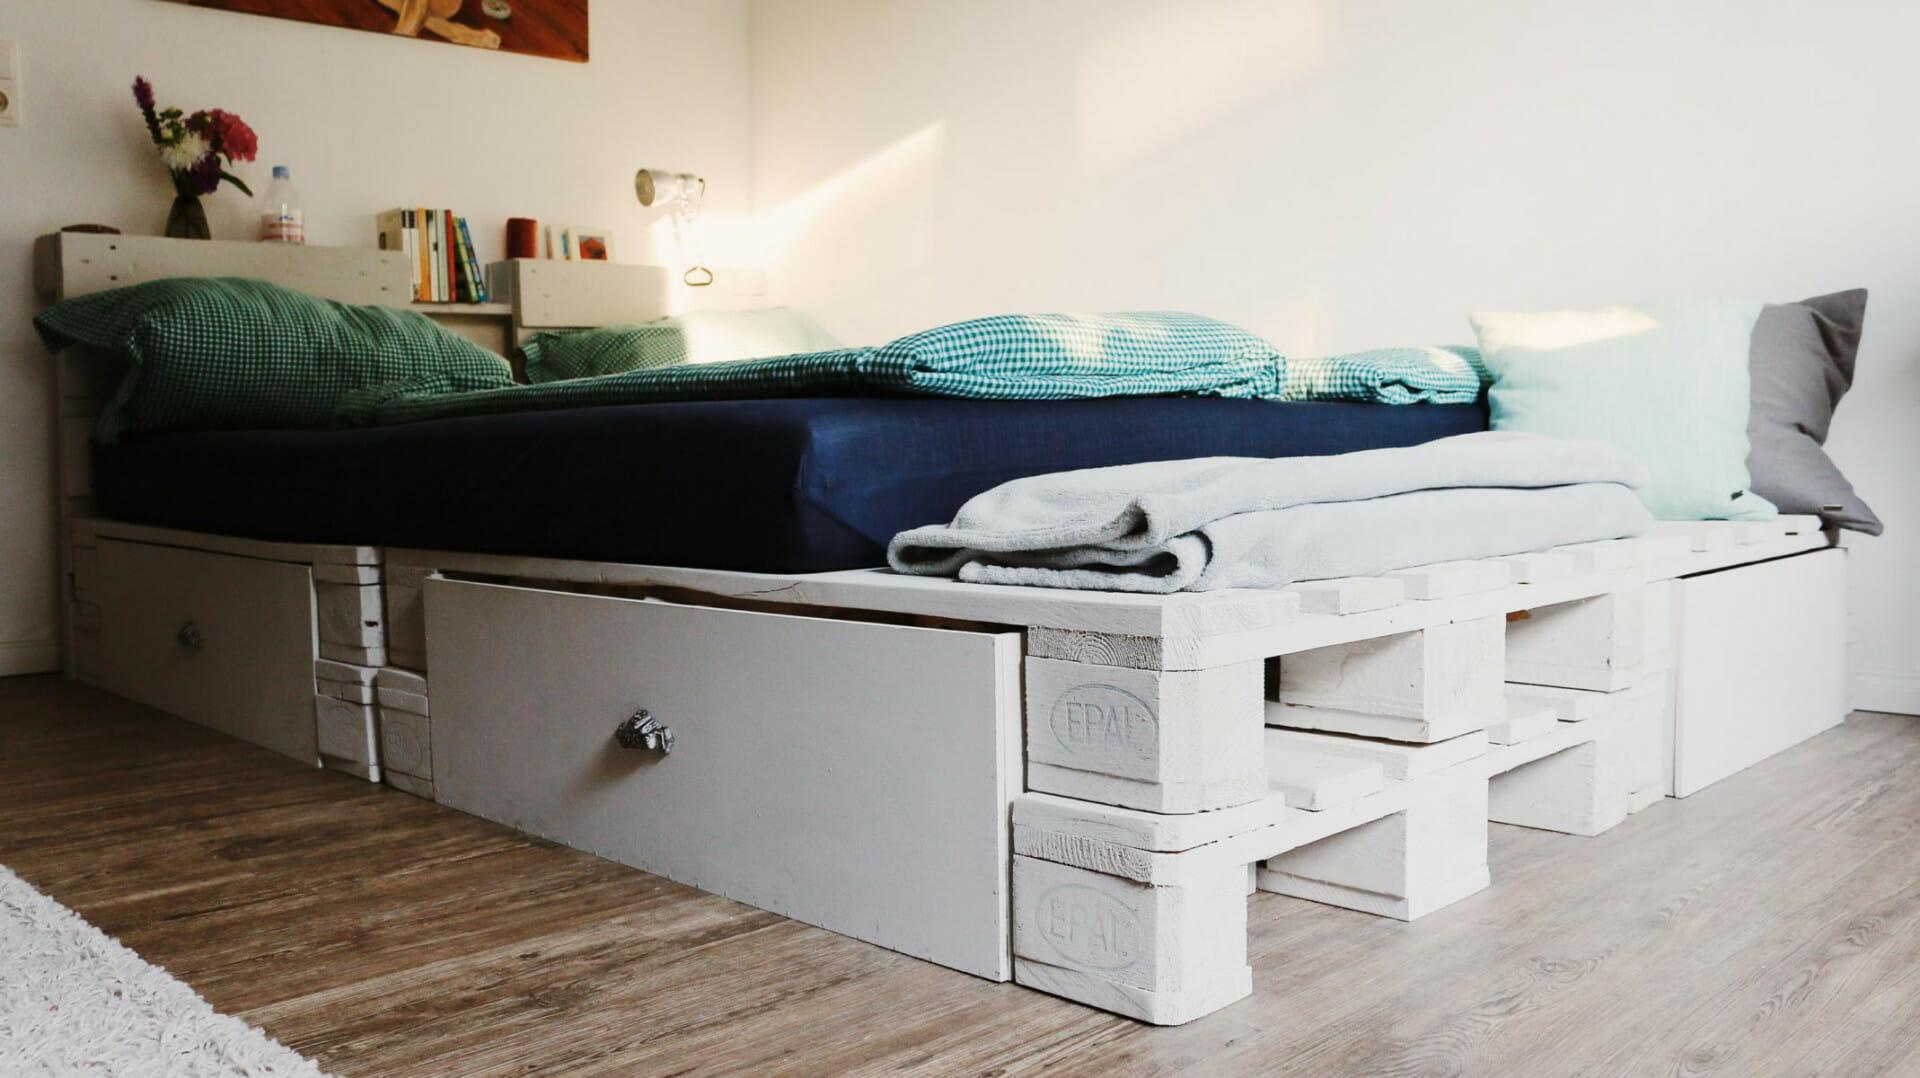 Full Size of Bett Palettenbett Selber Bauen Kaufen Europaletten Betten 90x200 Mit Unterbett Jugendstil Barock Bettkasten 140x200 Rauch Schramm Amerikanische Ruf Bett 1.40 Bett